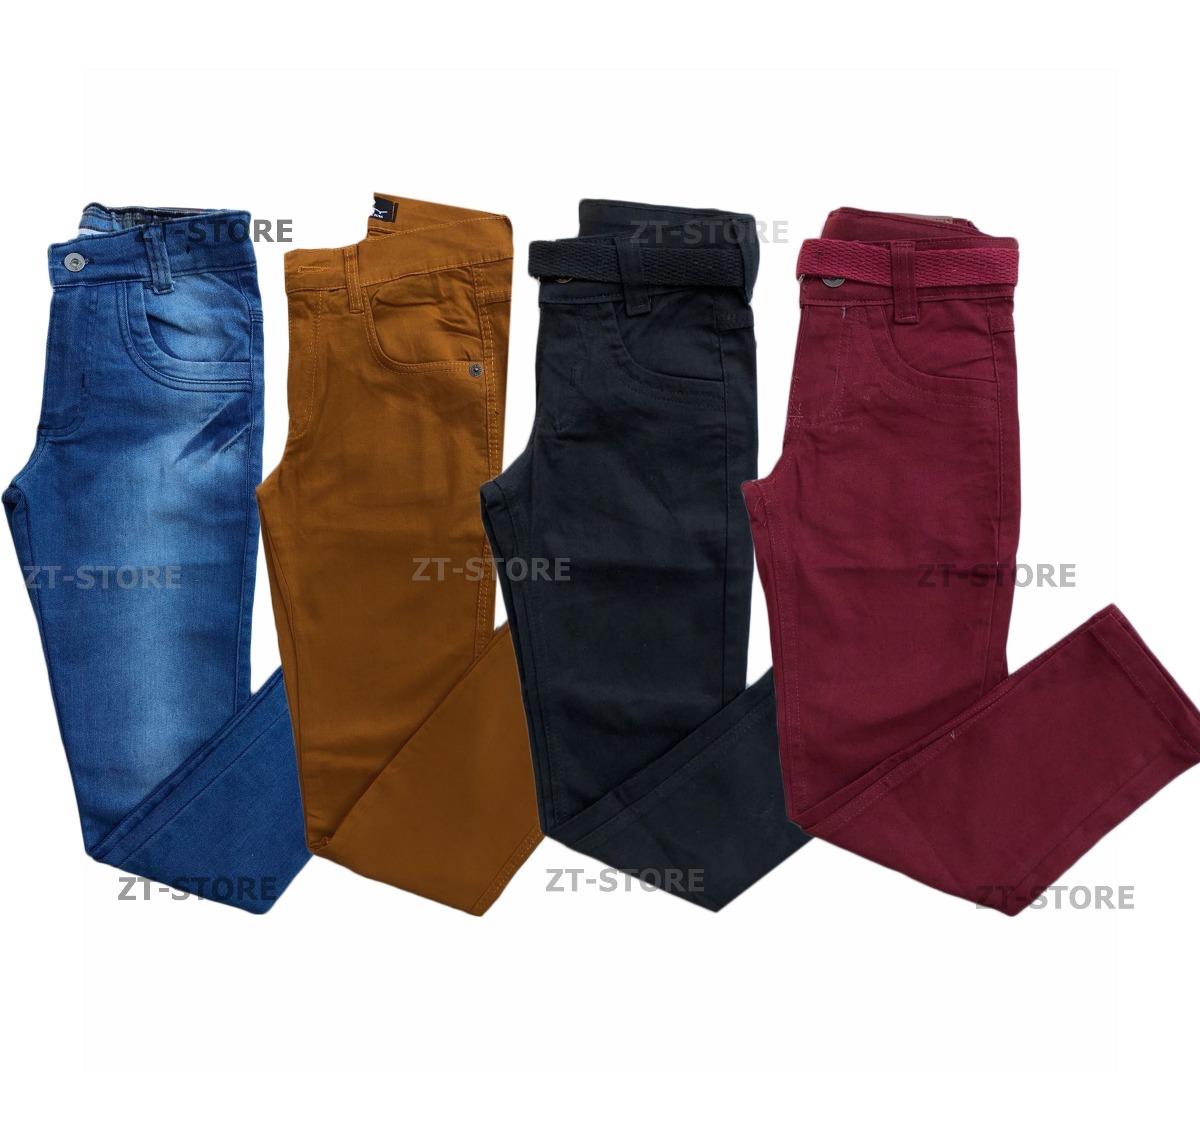 a35f3f09f kit 5 calça jeans masculina infantil + 5 calças masculinas. Carregando zoom.